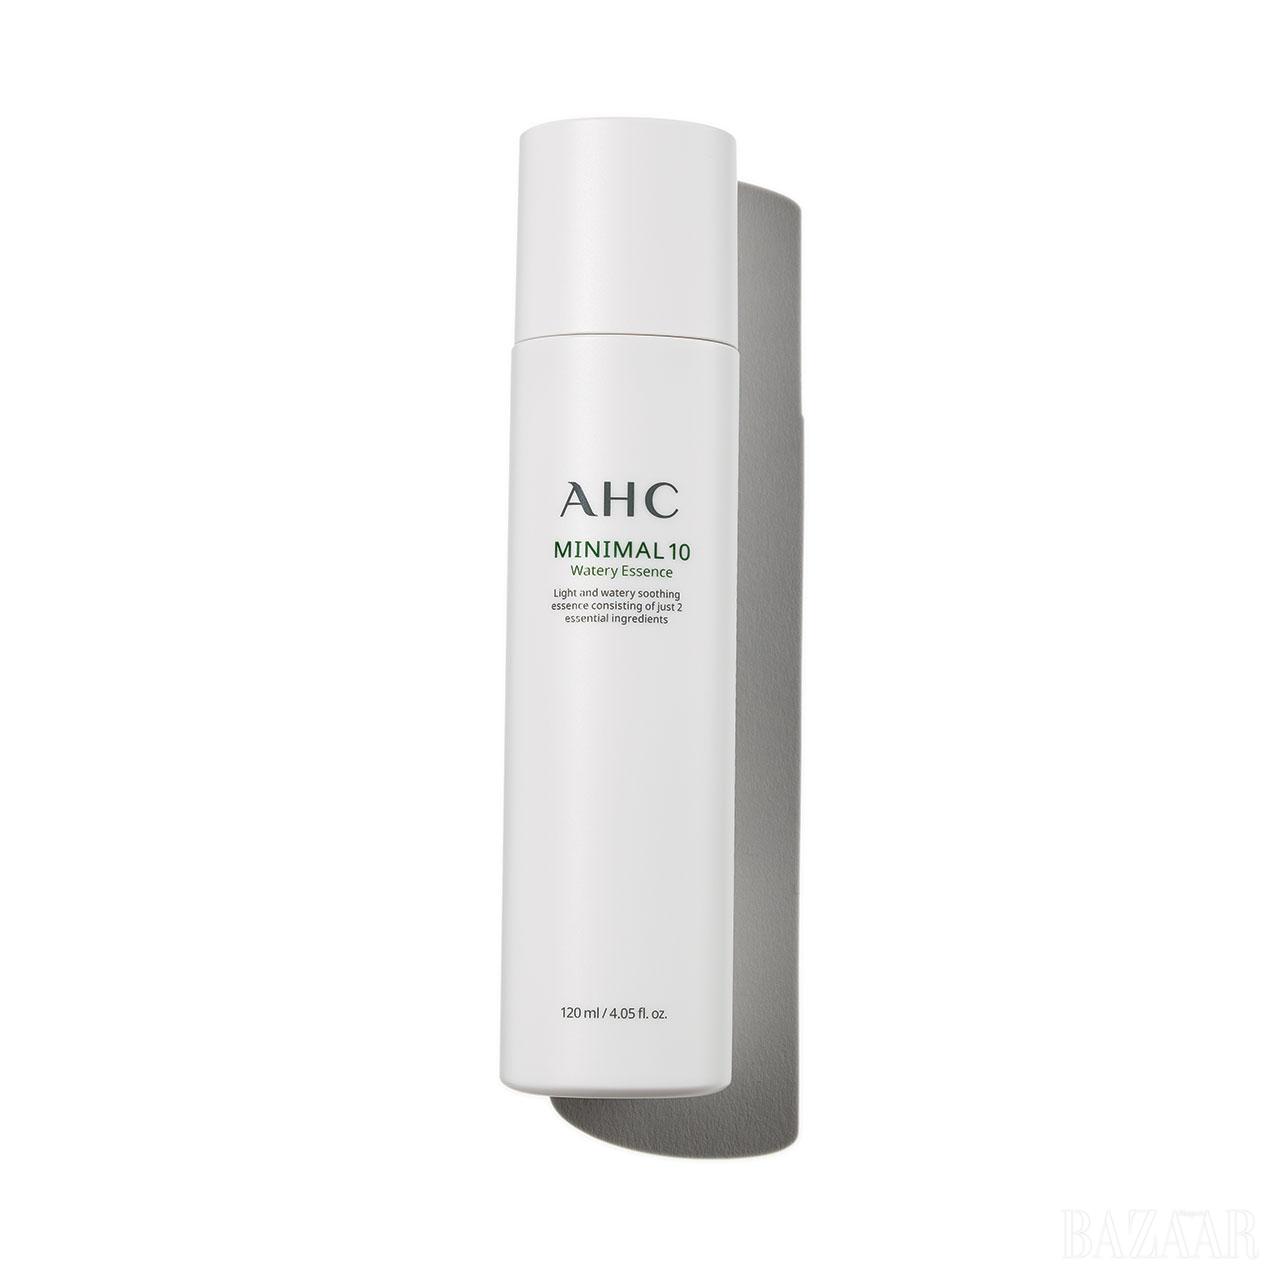 Ahc 미니멀 10 워터리 에센스 병풀 추출물 순수 원액을 포함한 단 2가지 성분으로 피부 본연의 힘을 강화해준다. 3만2천원.